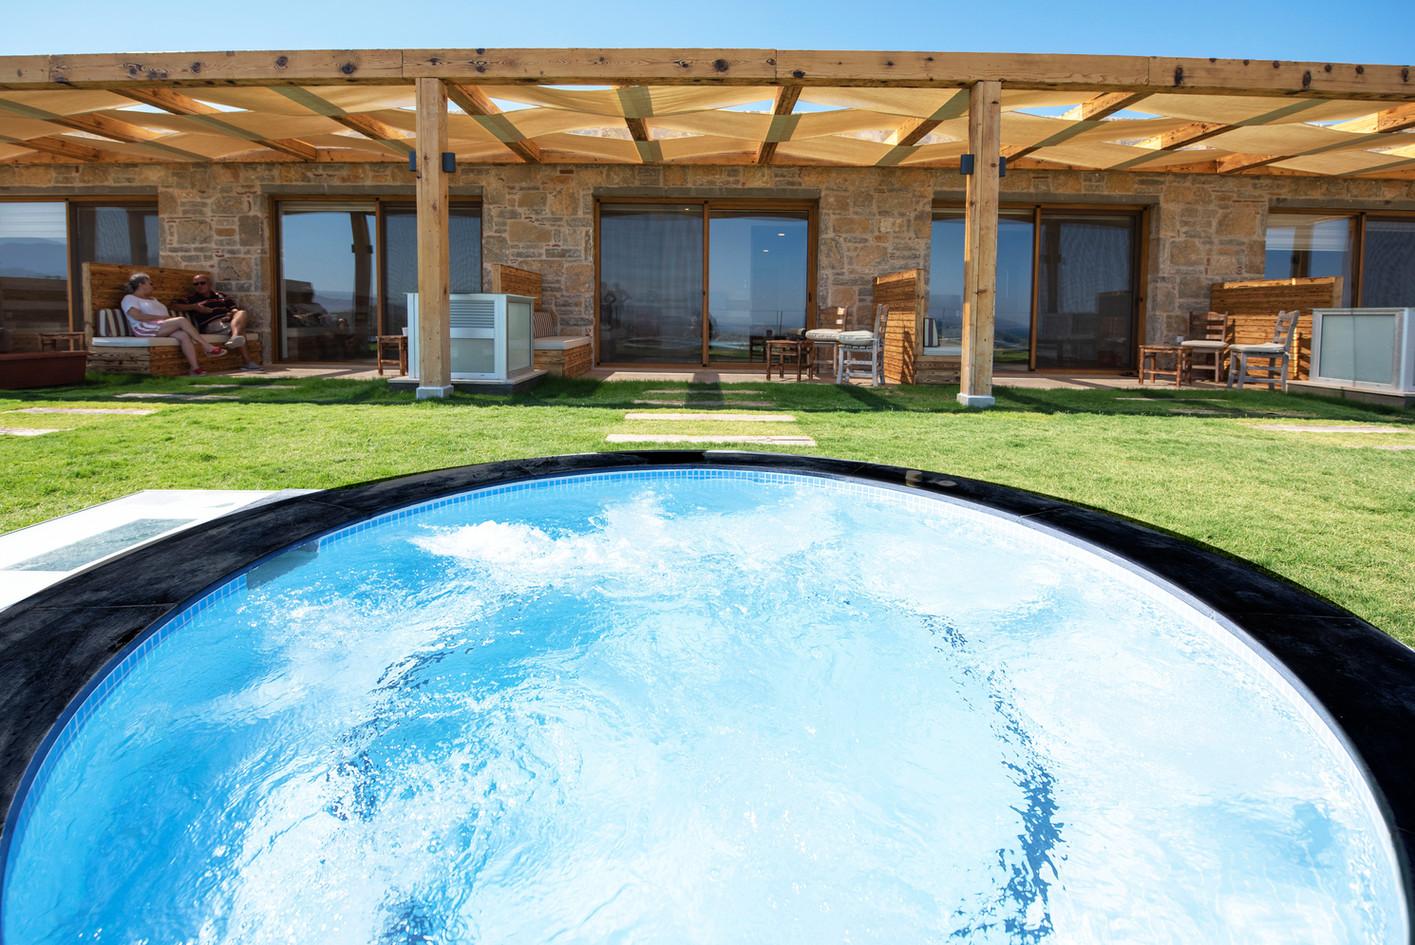 Masaj Havuzu_Massage Pool